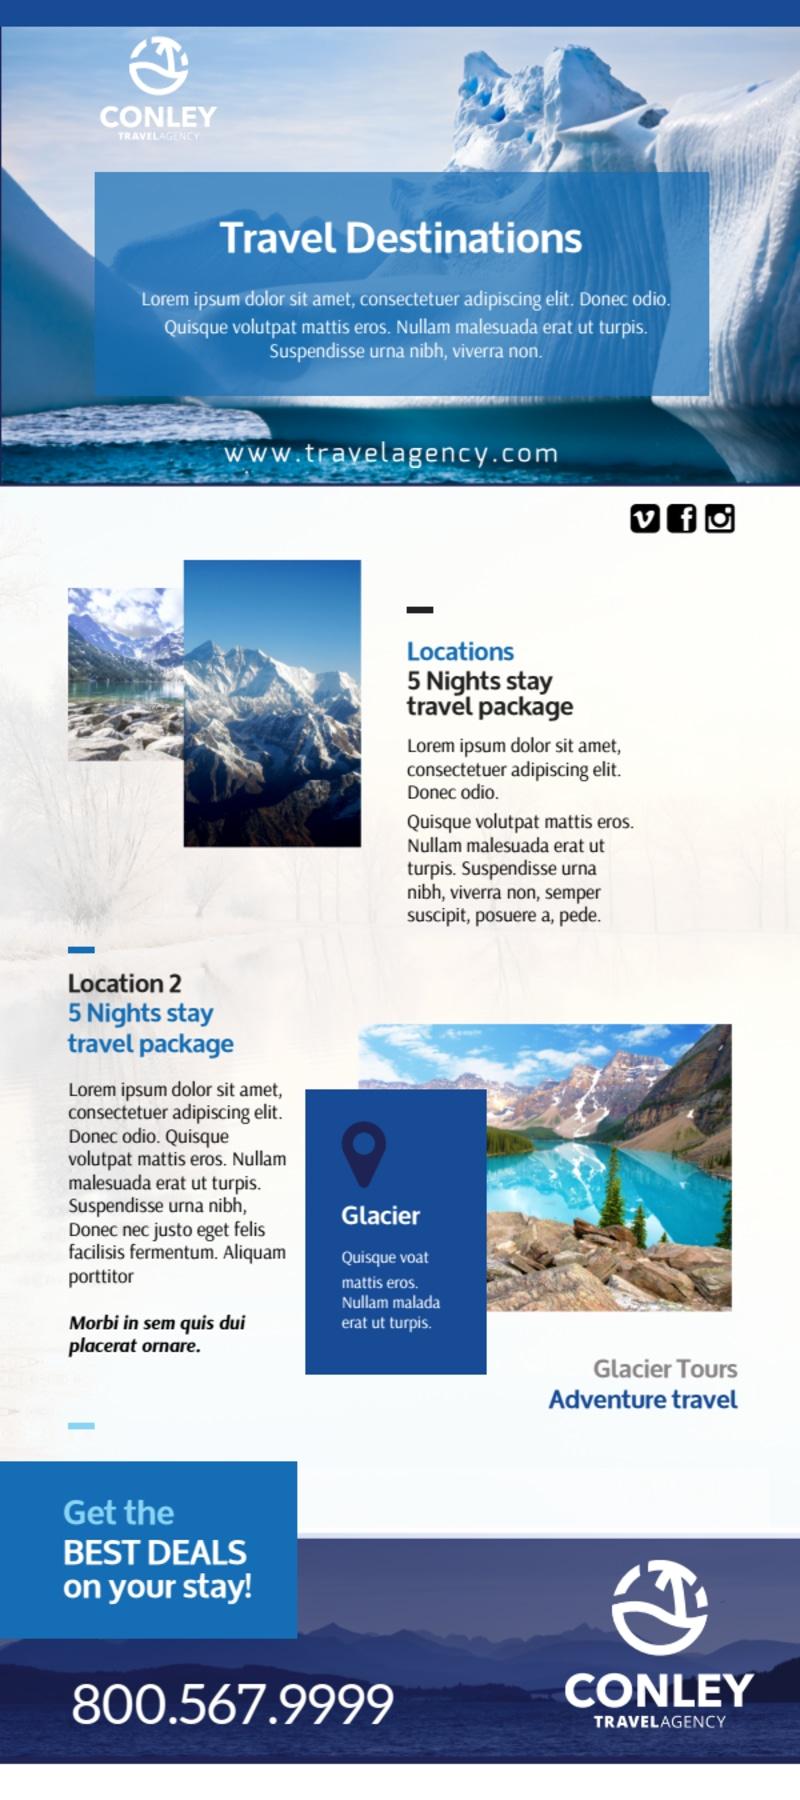 Conley Travel Activities Flyer Template Preview 2